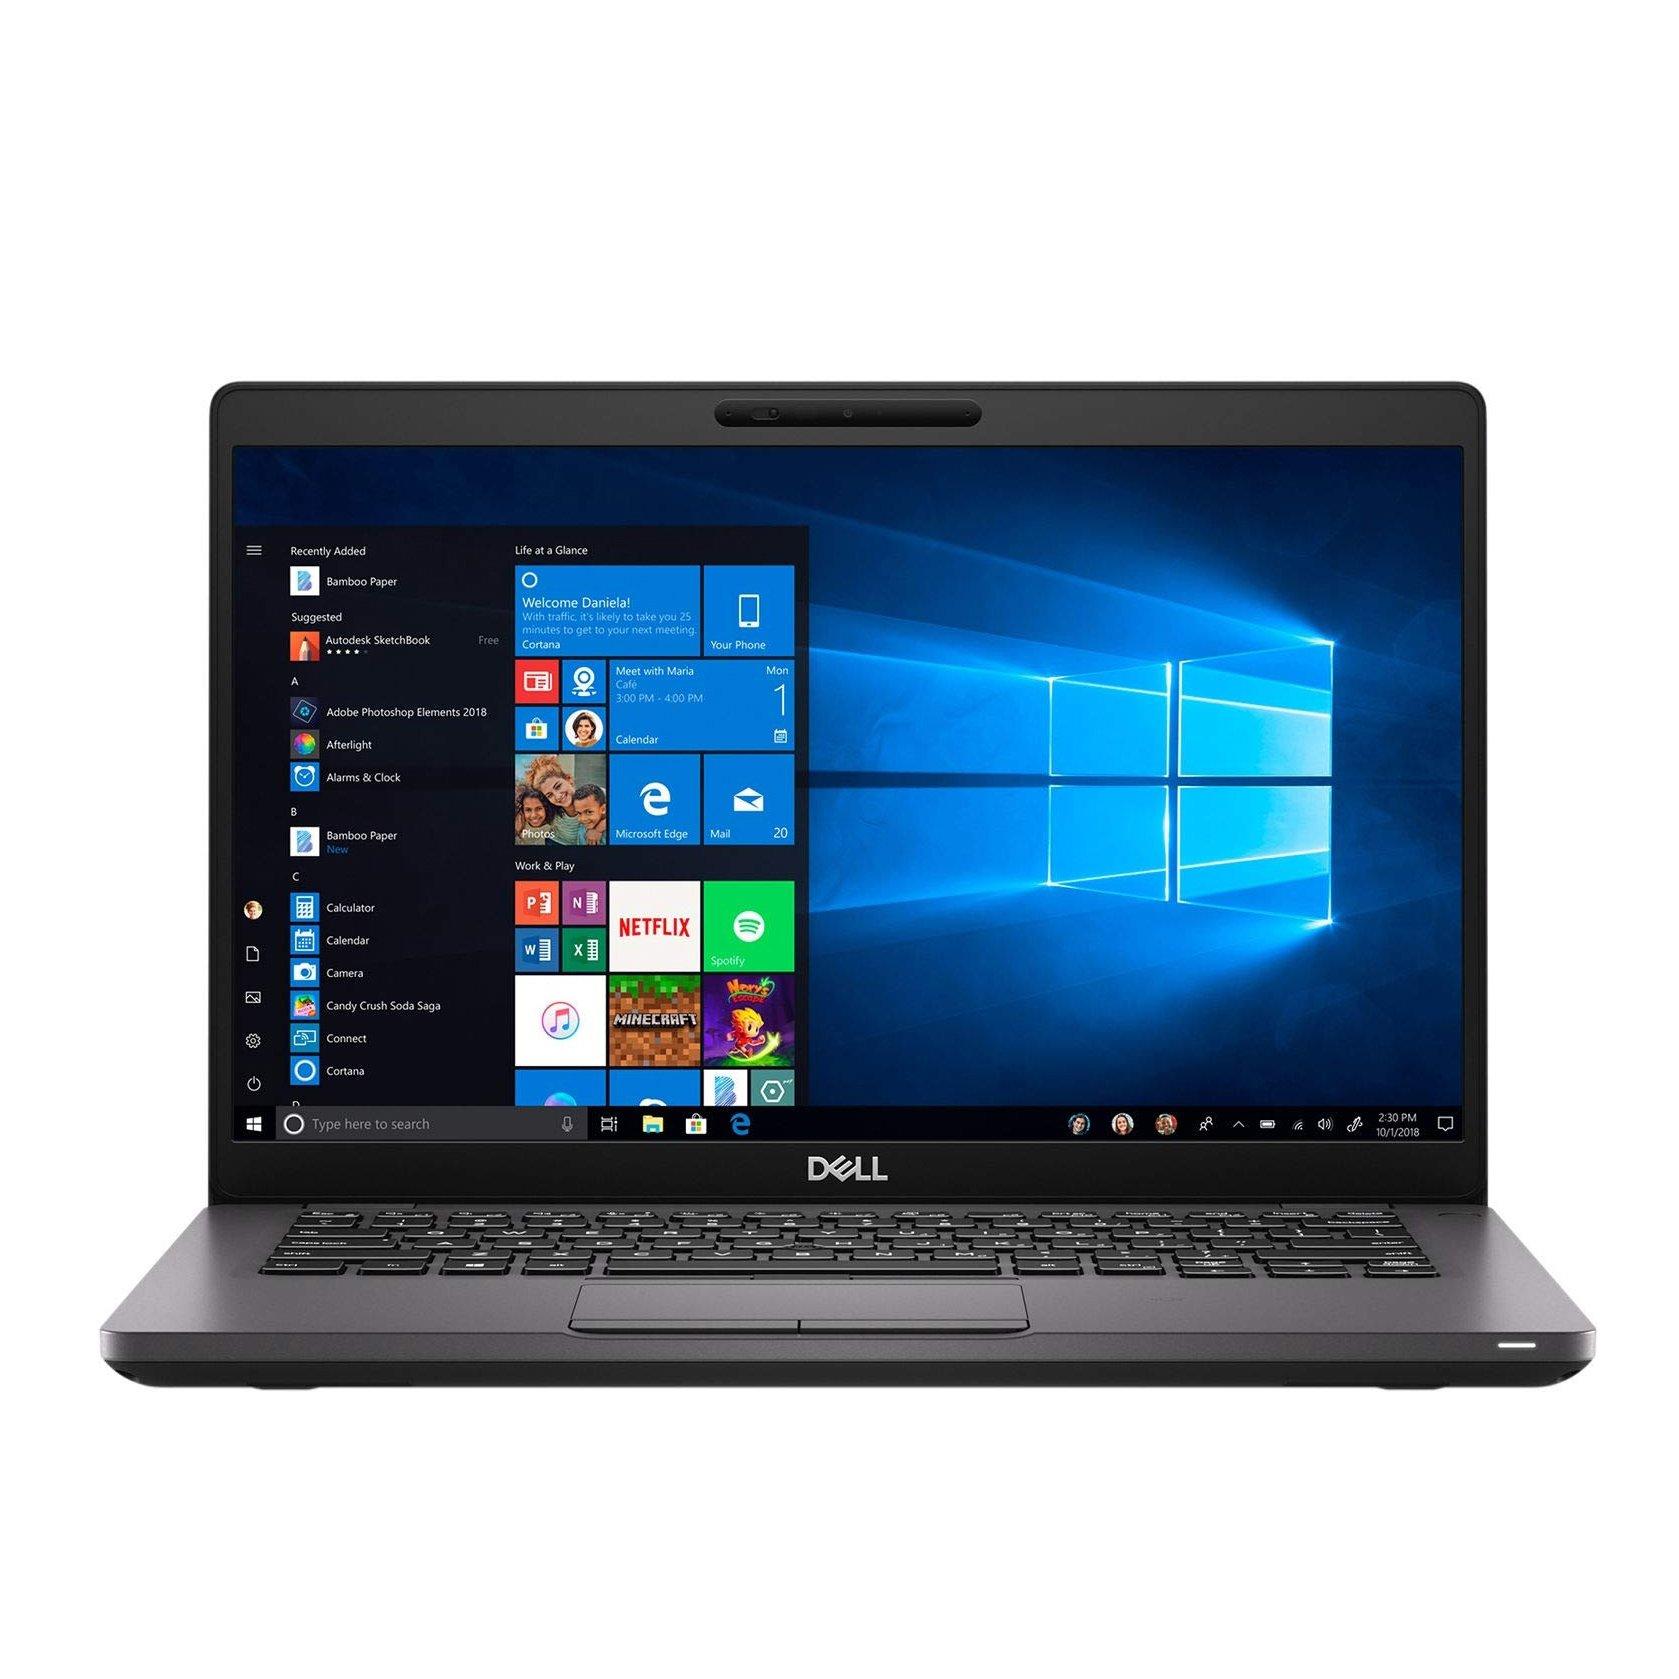 laptop_dell_latitude_5400-longbinh.com.vn_pcw2-vt